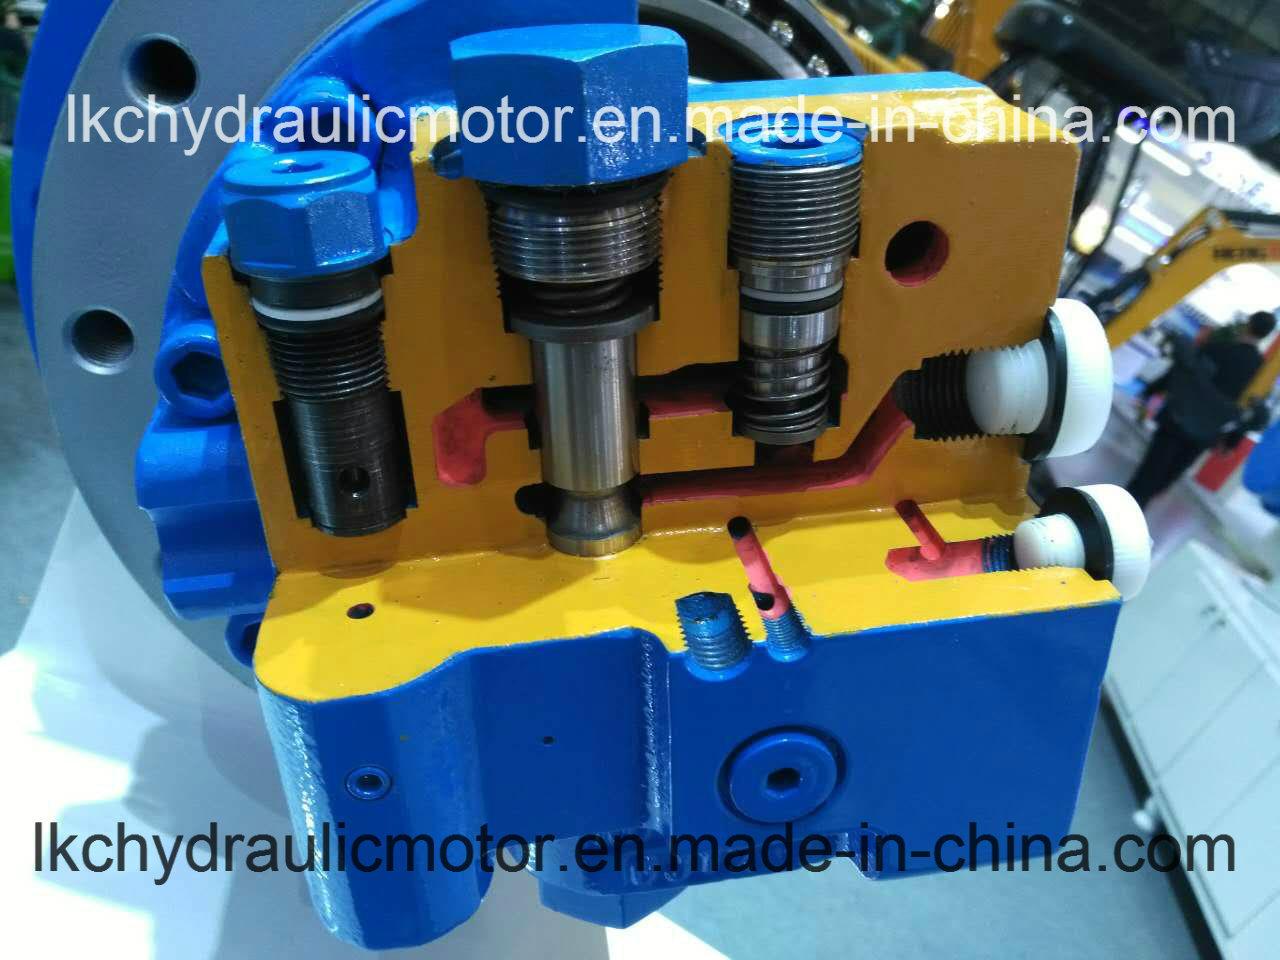 Final Drive Hydraulic Travel Motor for 0.8t~36t Crawler Equipment (LTM02 ~LTM60)